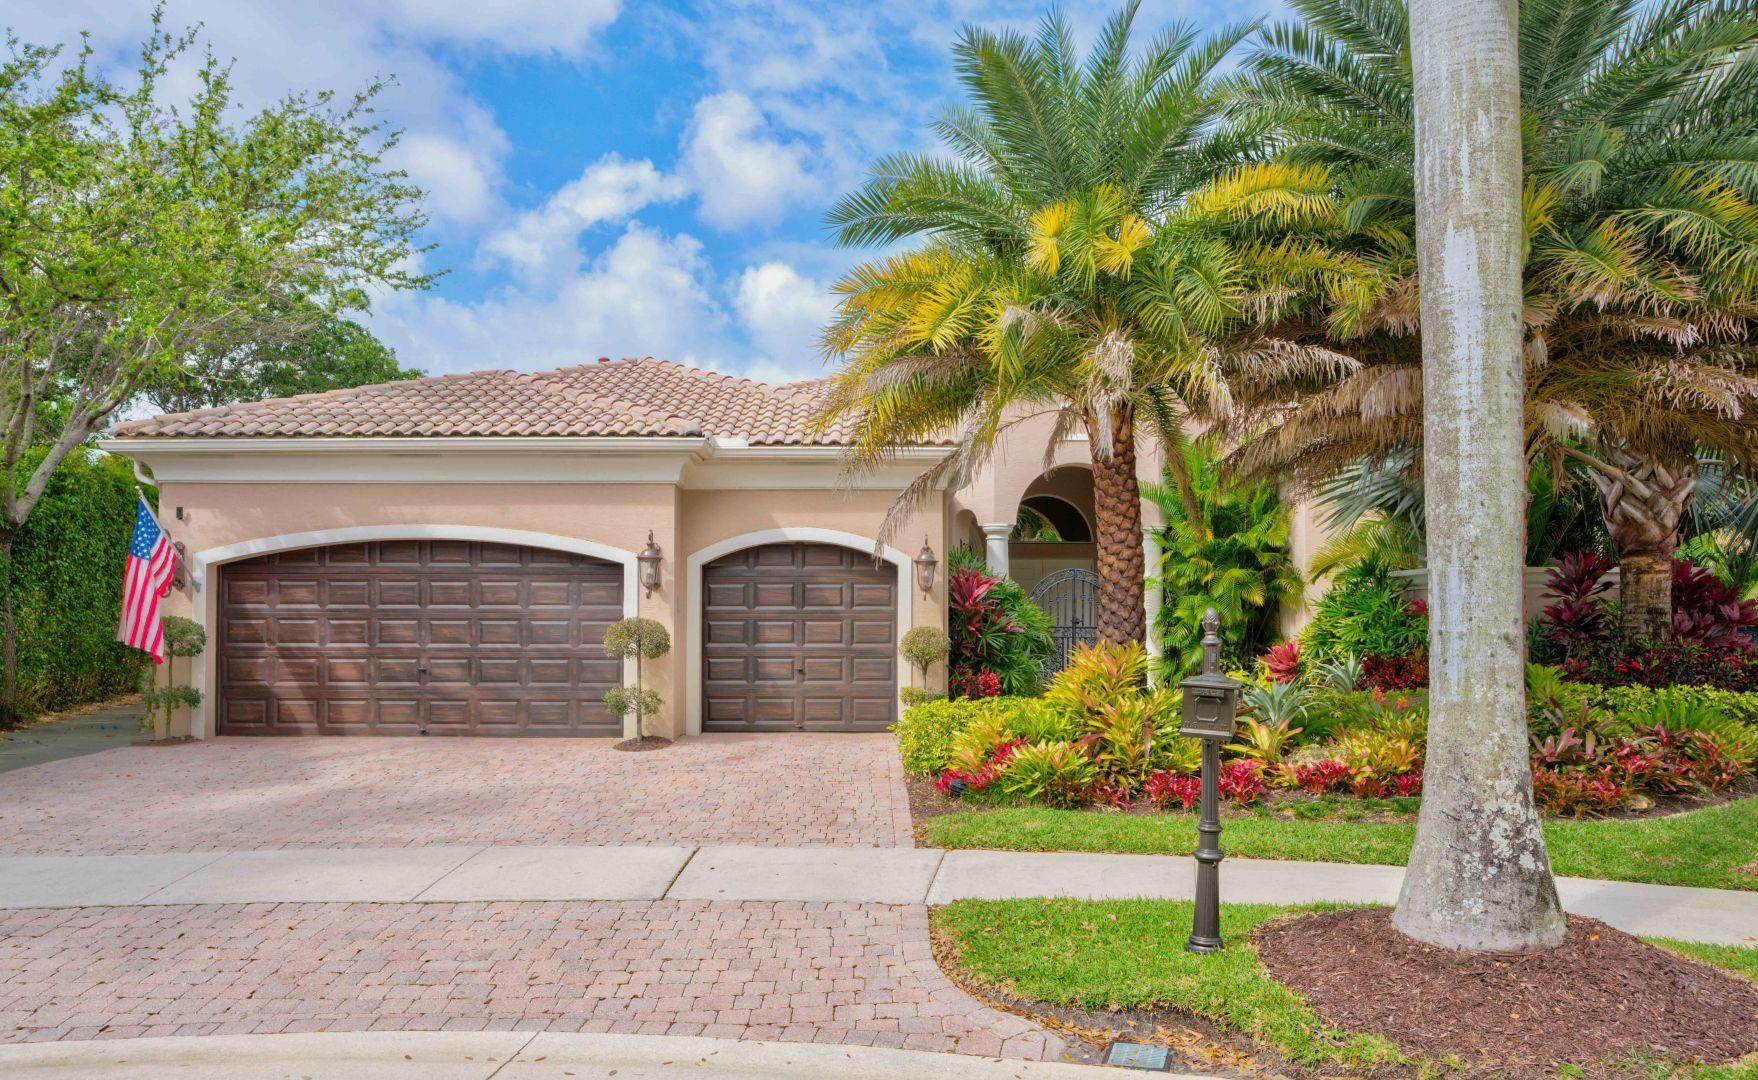 305 Trieste Drive, Palm Beach Gardens, Florida 33418, 4 Bedrooms Bedrooms, ,4 BathroomsBathrooms,A,Single family,Trieste,RX-10608389